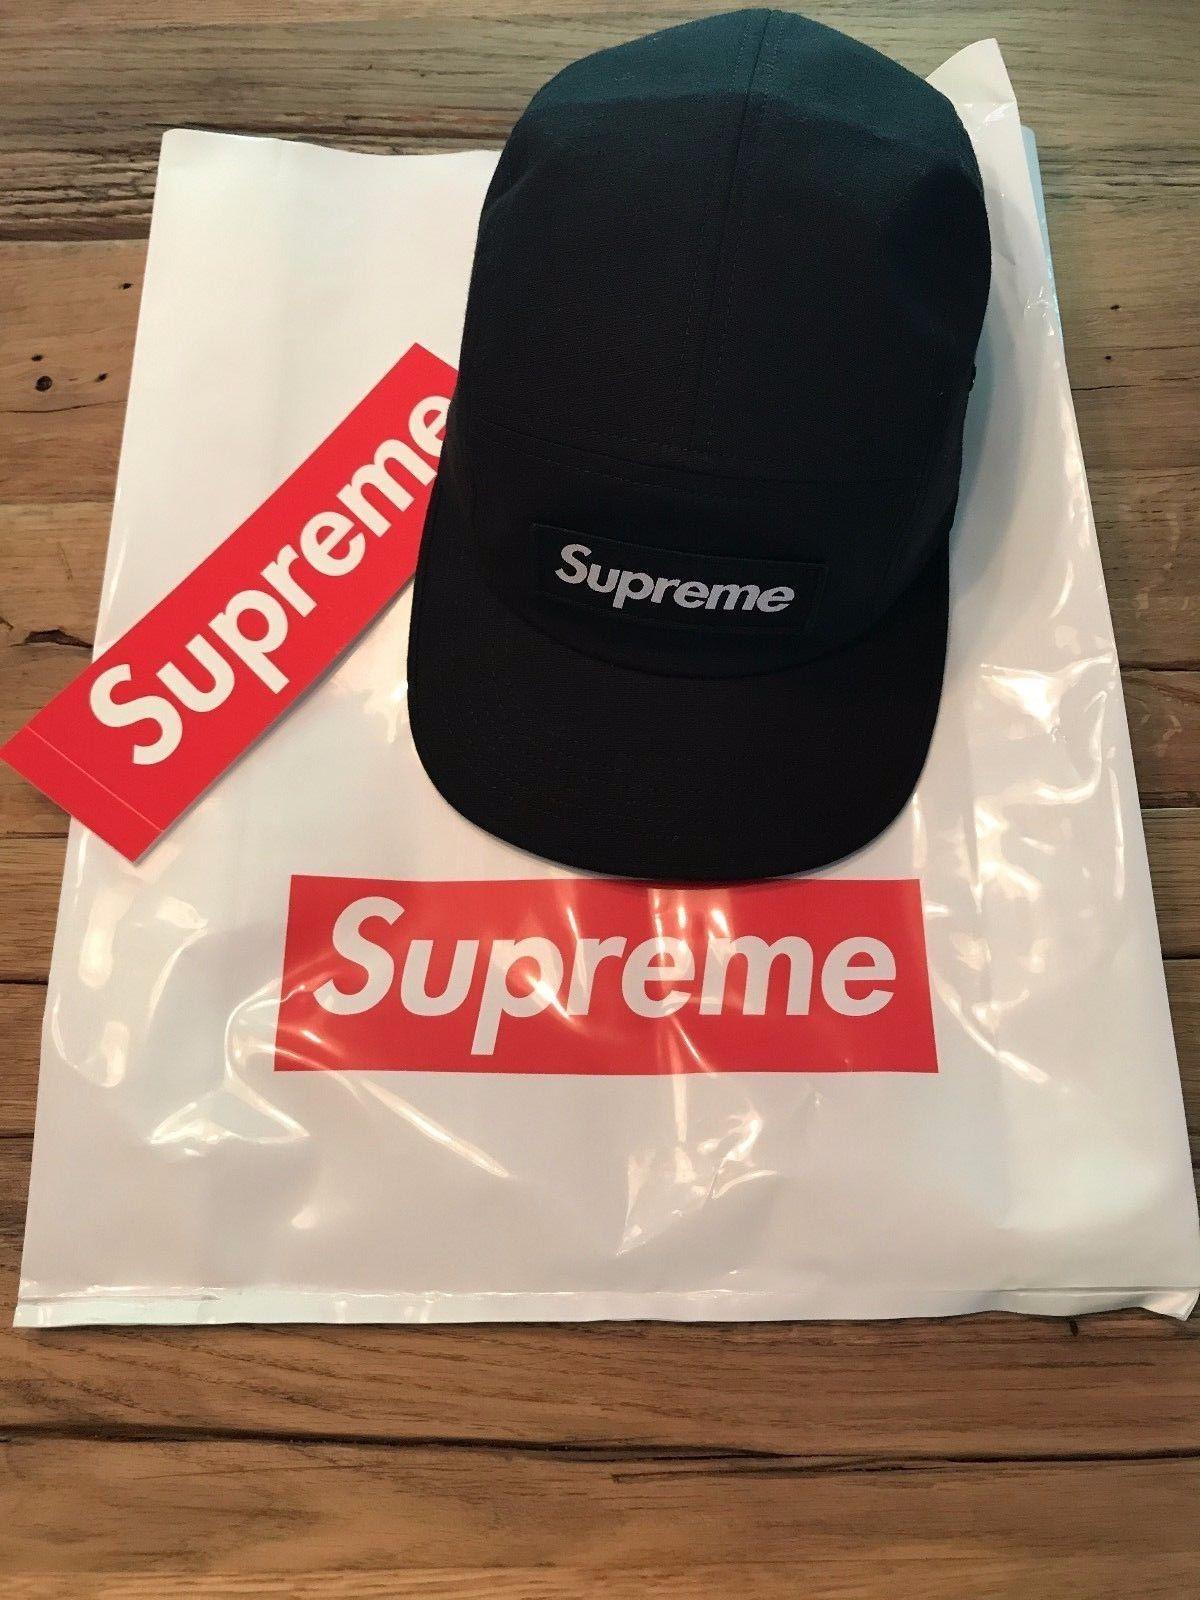 c89ec7dfde5eb Supreme 2015 S S Cdg Box Logo Ripstop Camp and 50 similar items